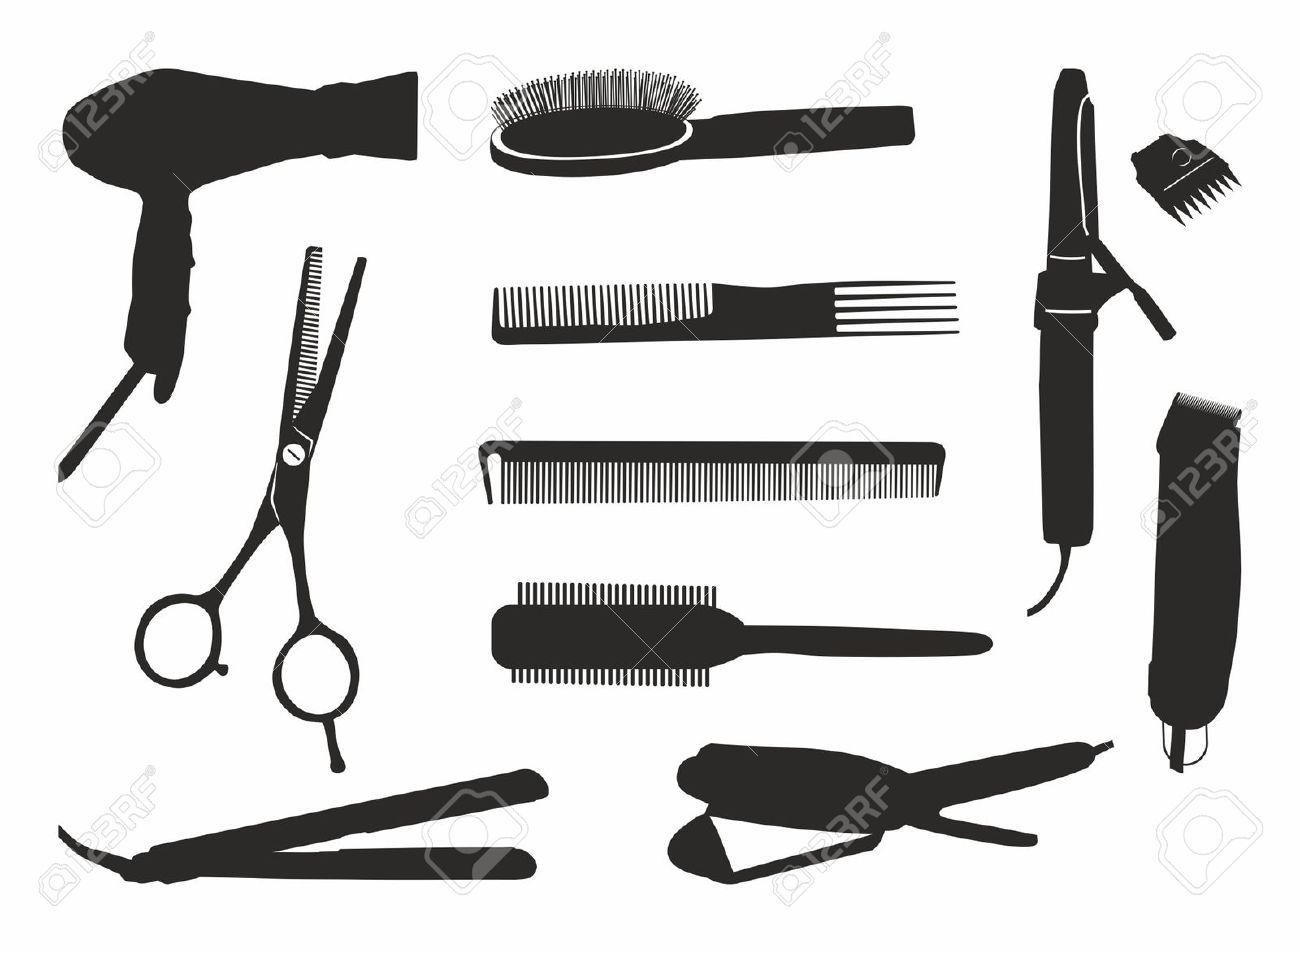 hair stylist tools clipart.